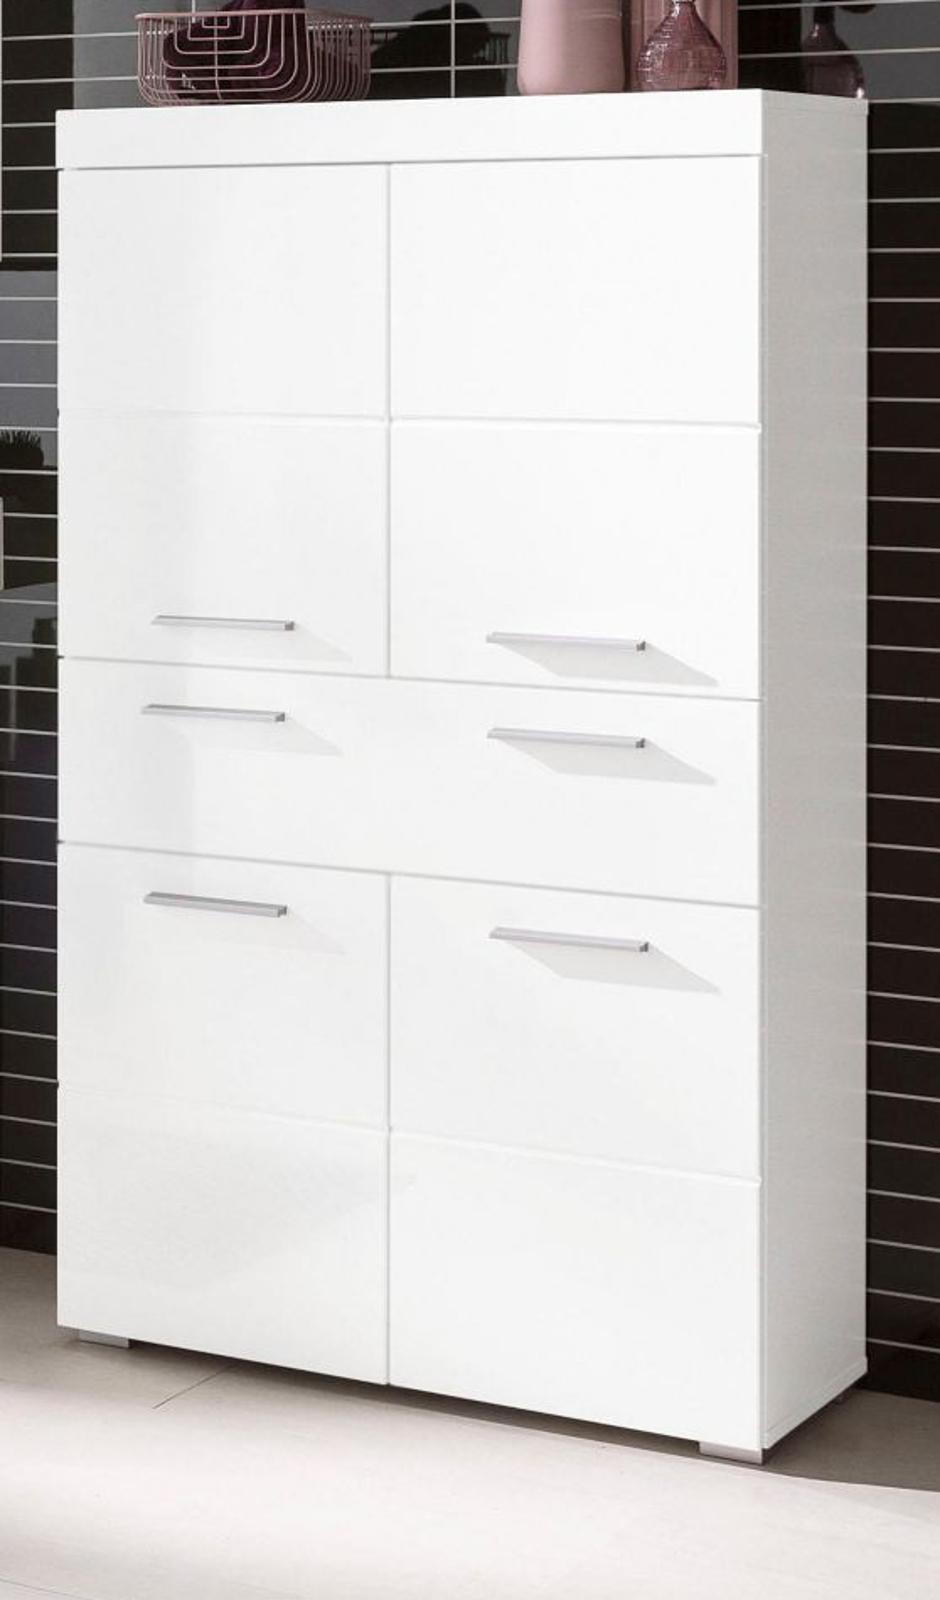 badezimmer standschrank amanda wei hochglanz. Black Bedroom Furniture Sets. Home Design Ideas